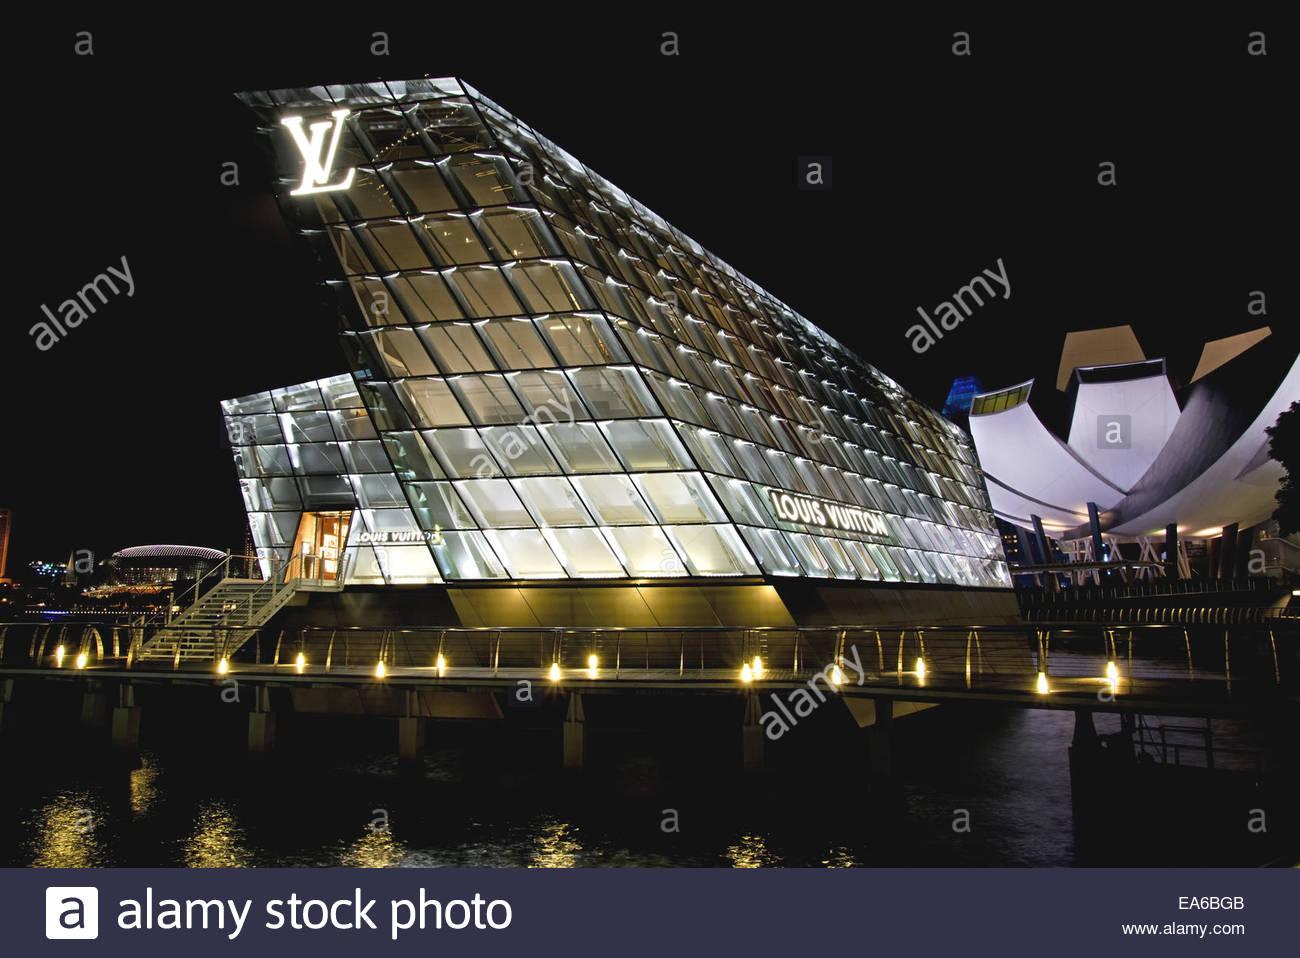 Louis Vuitton Flag Ship Store, Singapore - Stock Image